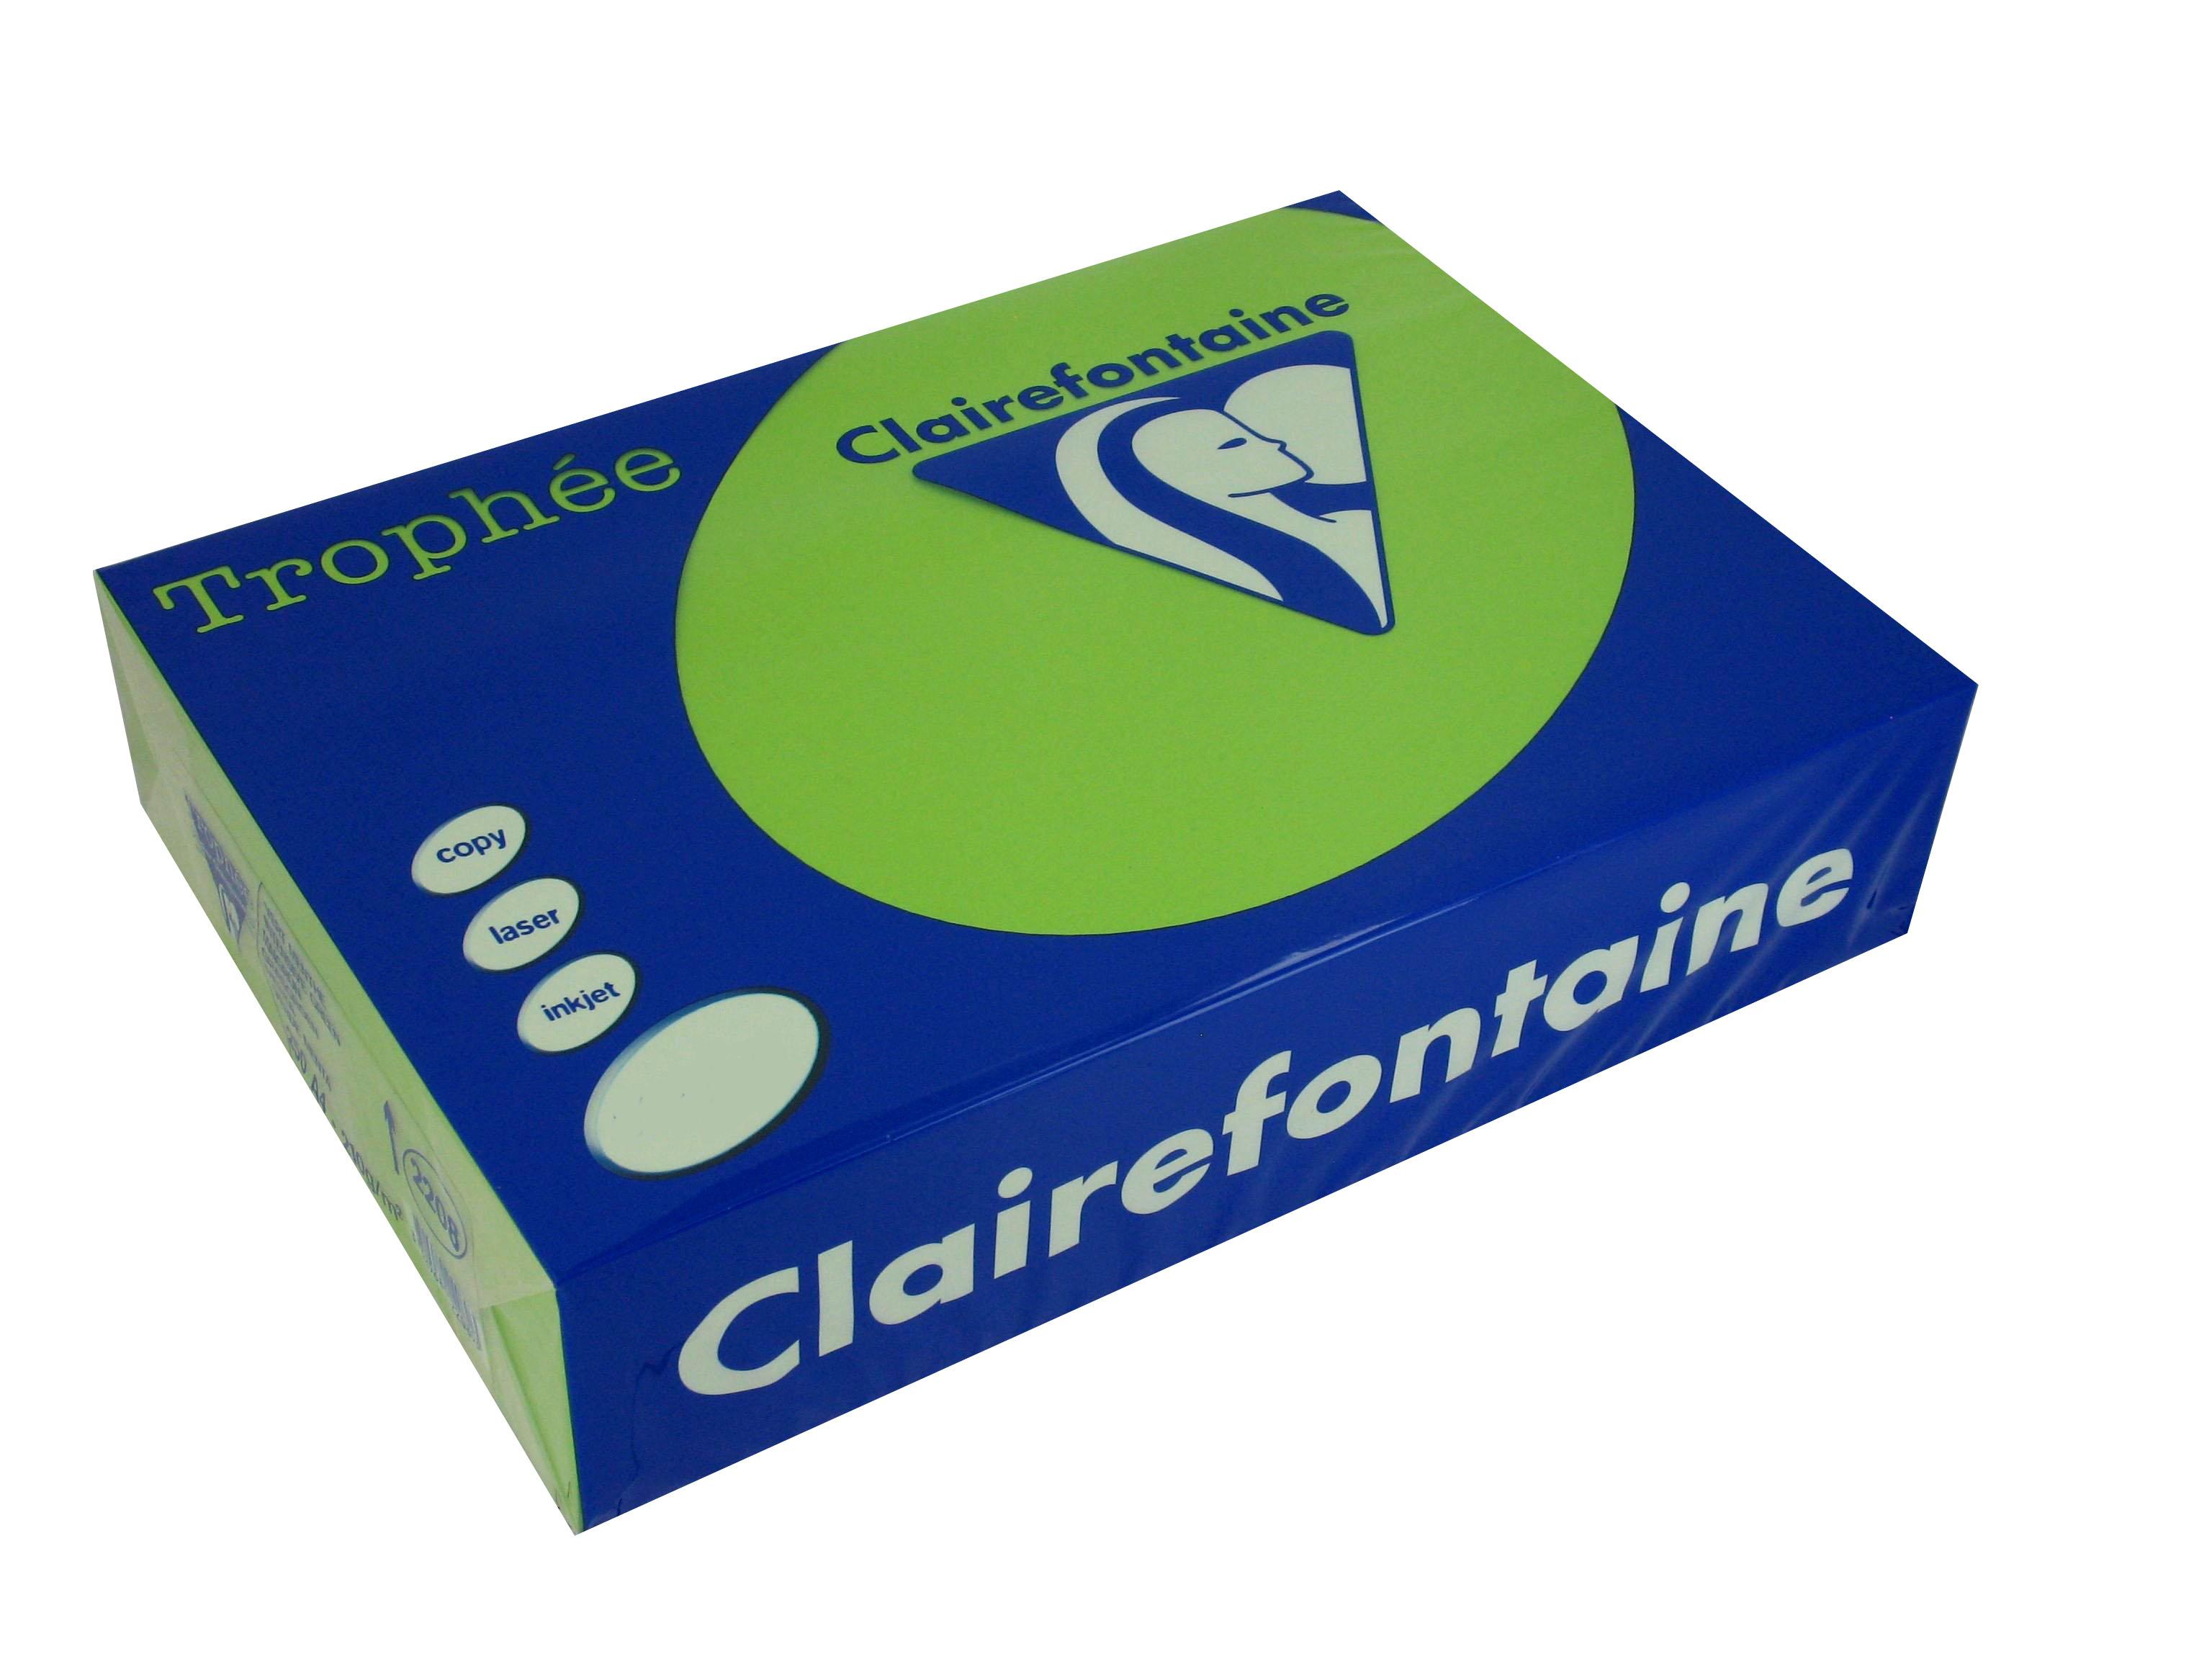 Vorschau: Clairefontaine Trophee Papier Maigrün 210g/m² DIN-A4 - 250 Blatt